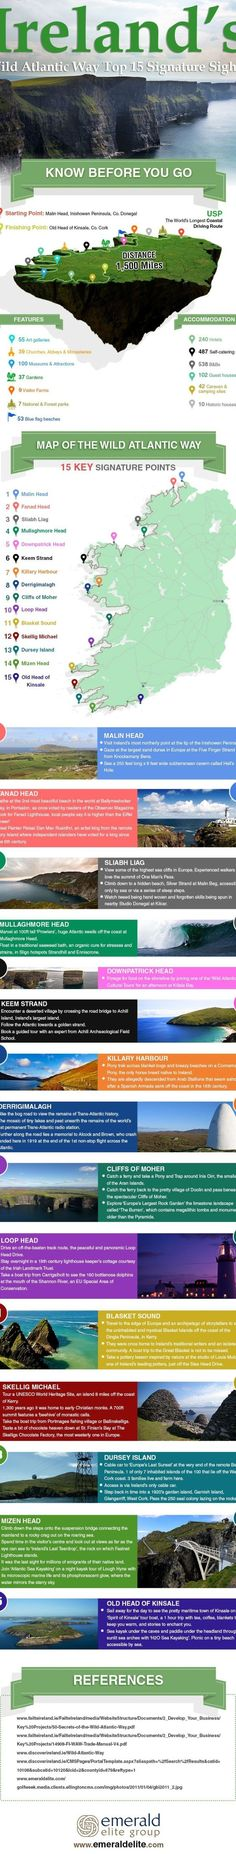 Ireland's Wild Atlantic Way sounds absolutely awesome. #Letsdoit #travelnow #Ireland